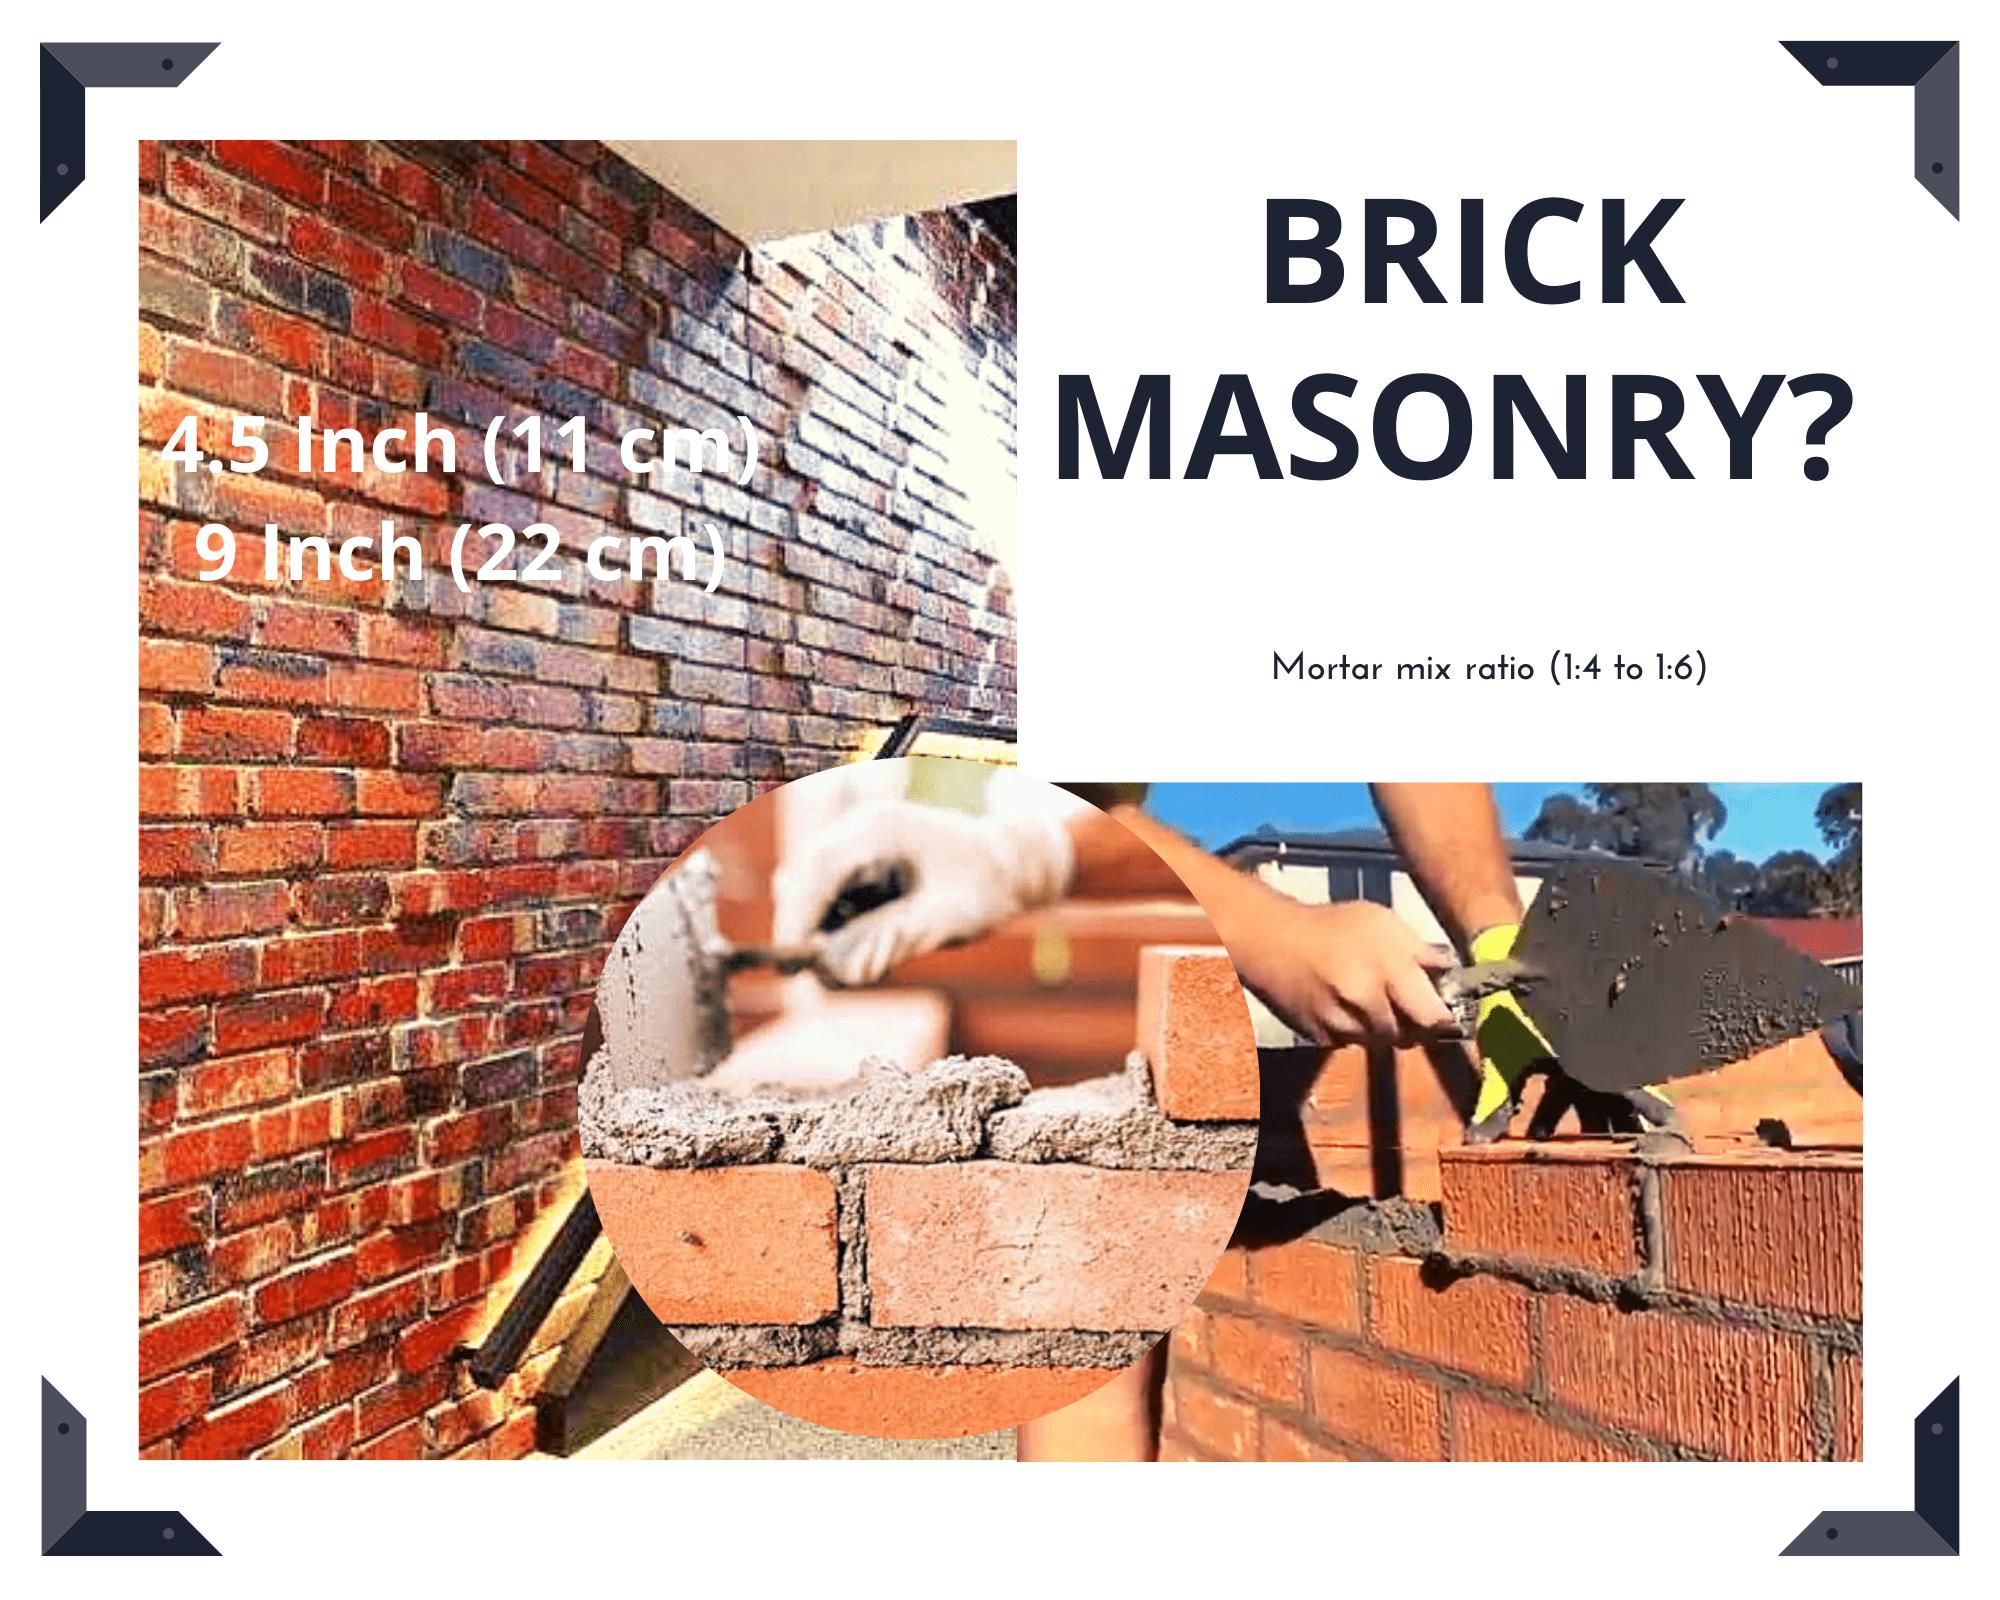 brick masonry0